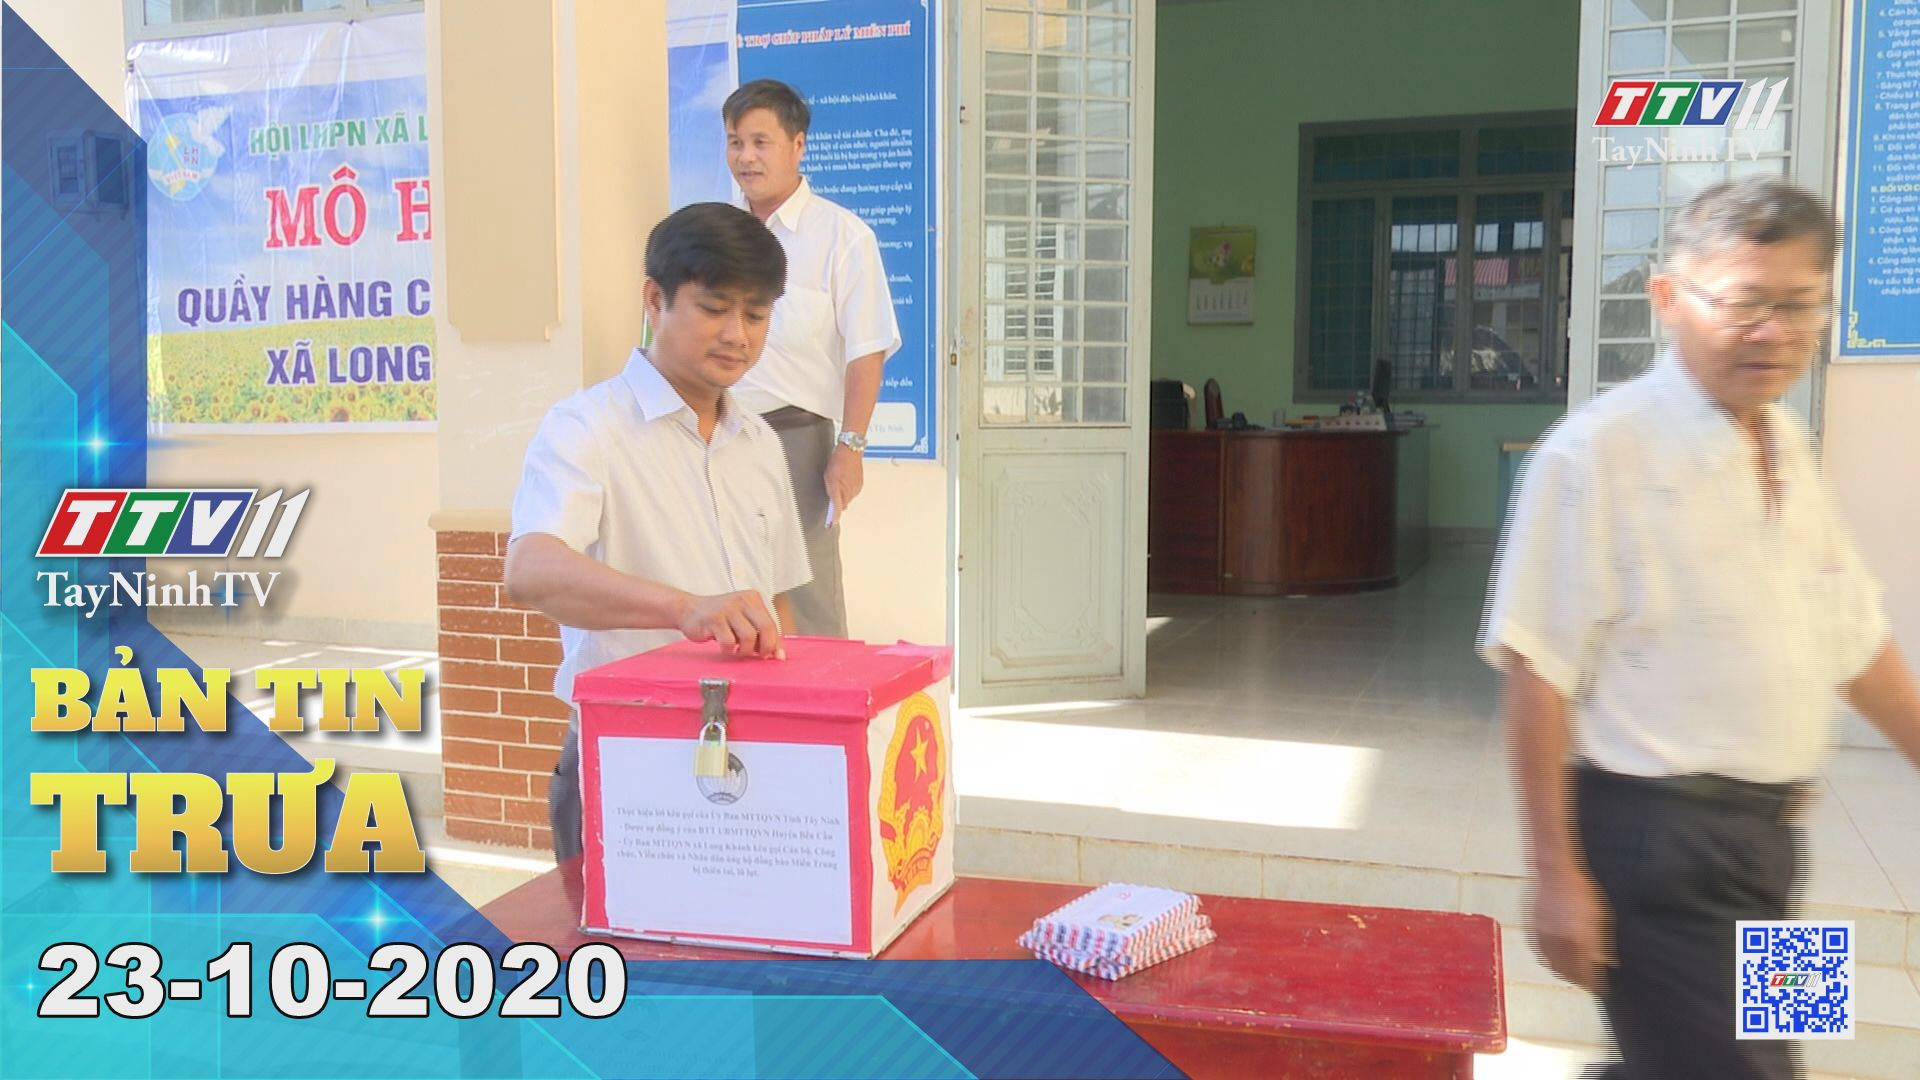 Bản tin trưa 23-10-2020 | Tin tức hôm nay | TayNinhTV